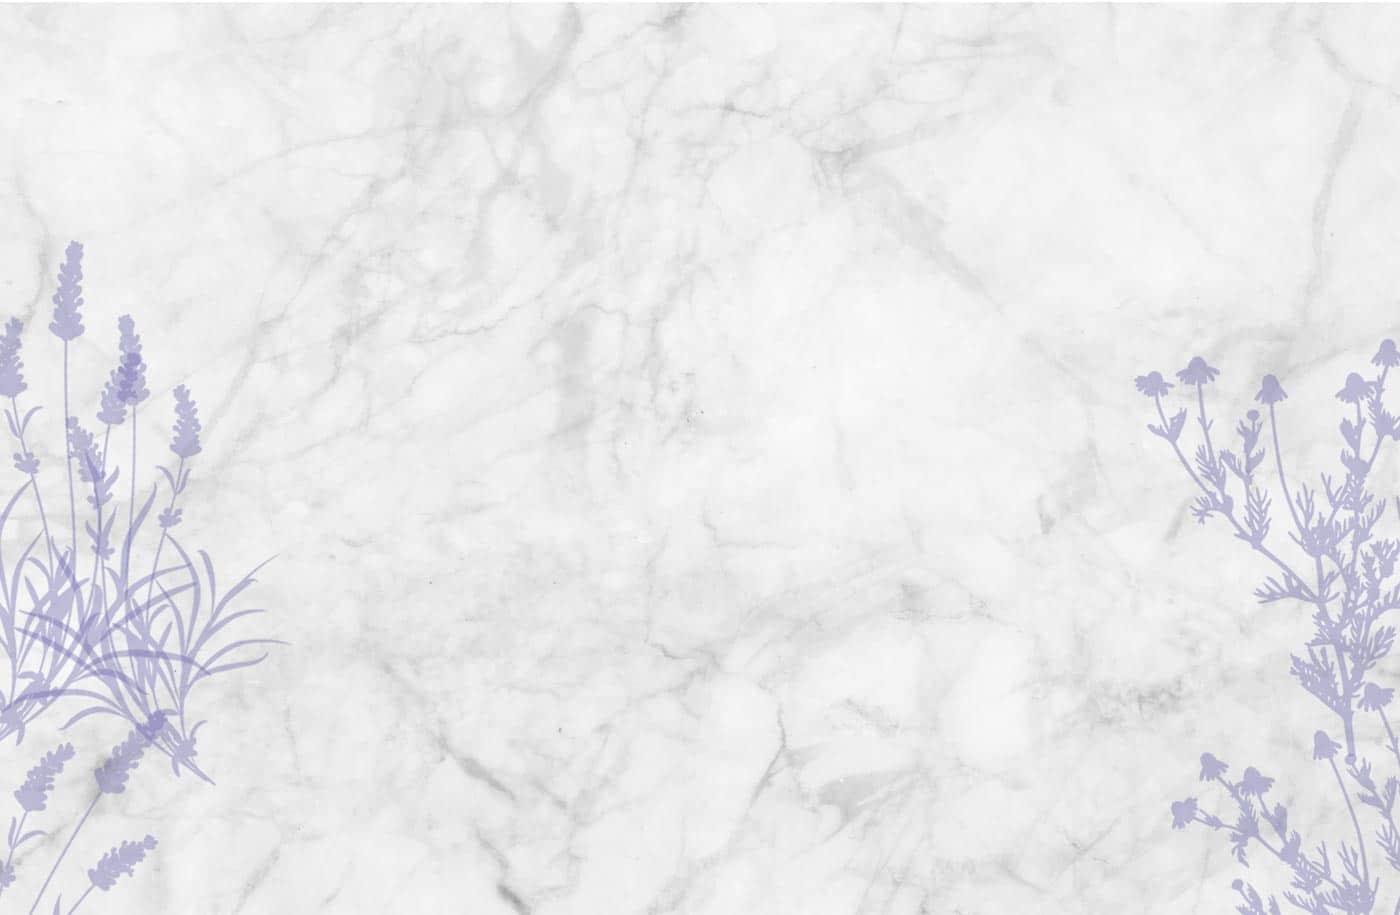 Lavender & Chamomile background